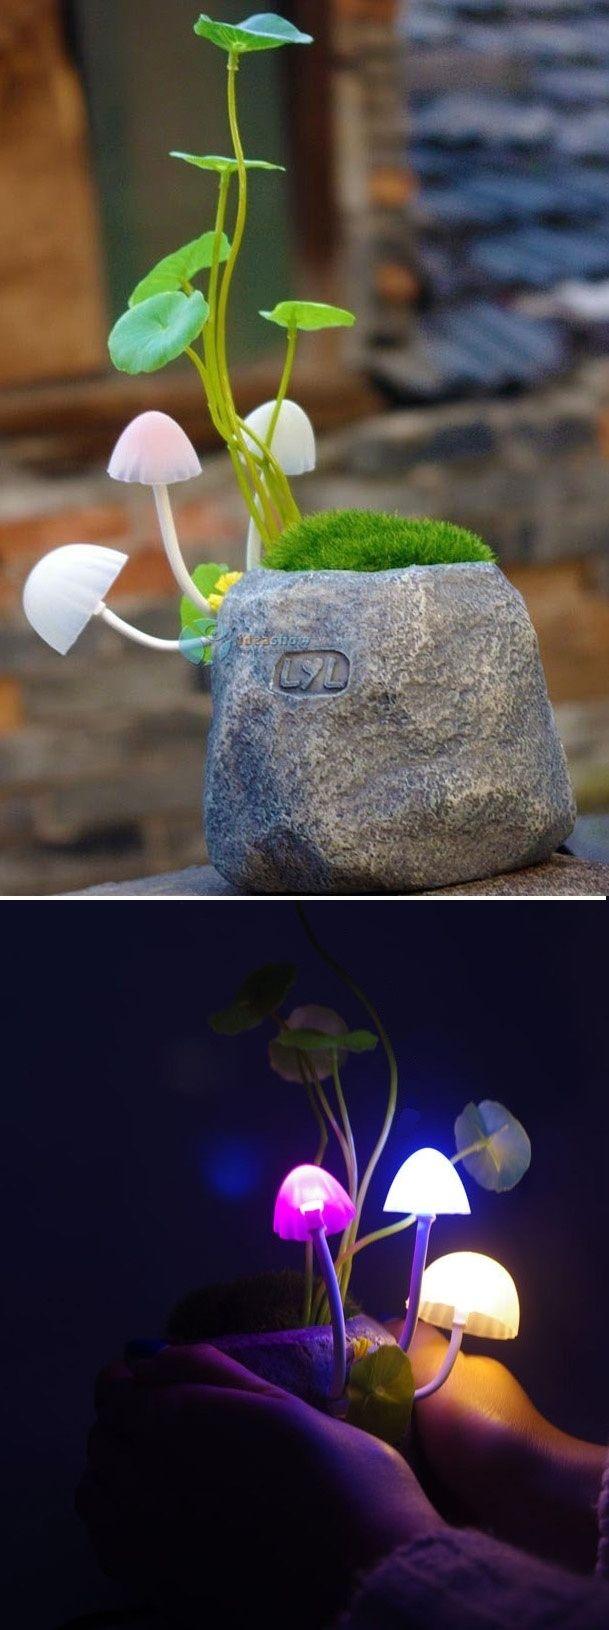 Mushroom Plant Night Light | 41 Coolest Night Lights To Buy Or DIY